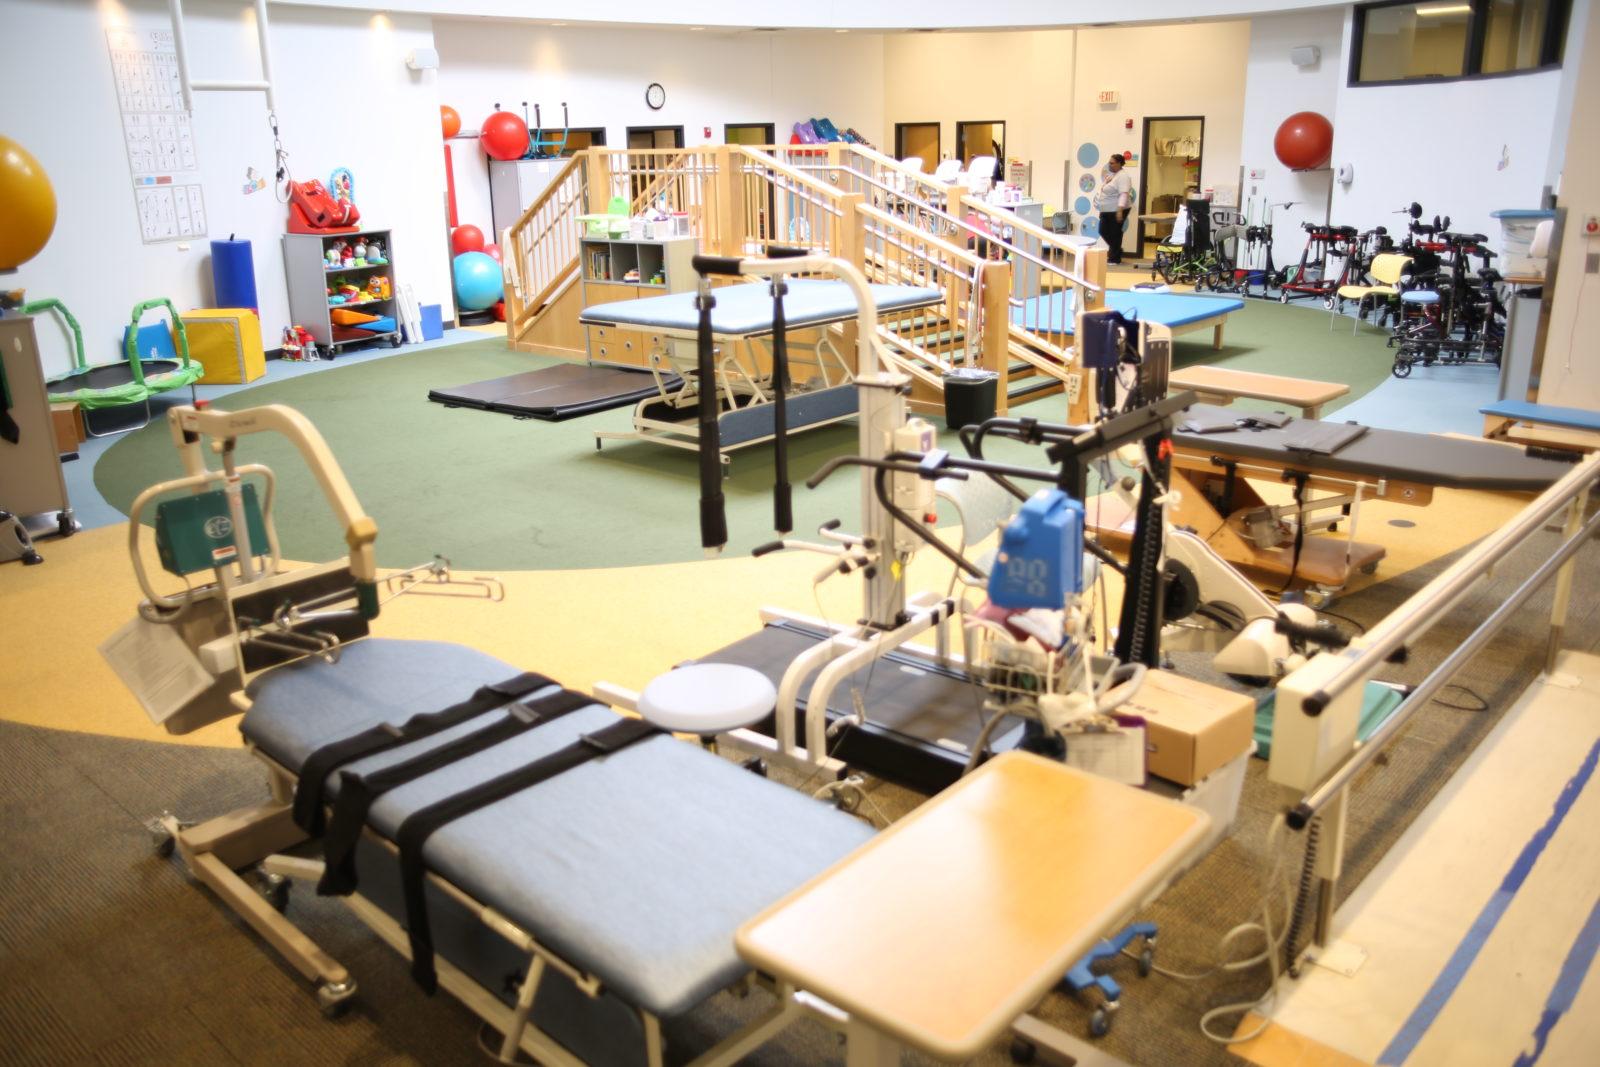 The Therapy Gym at Ranken Jordan